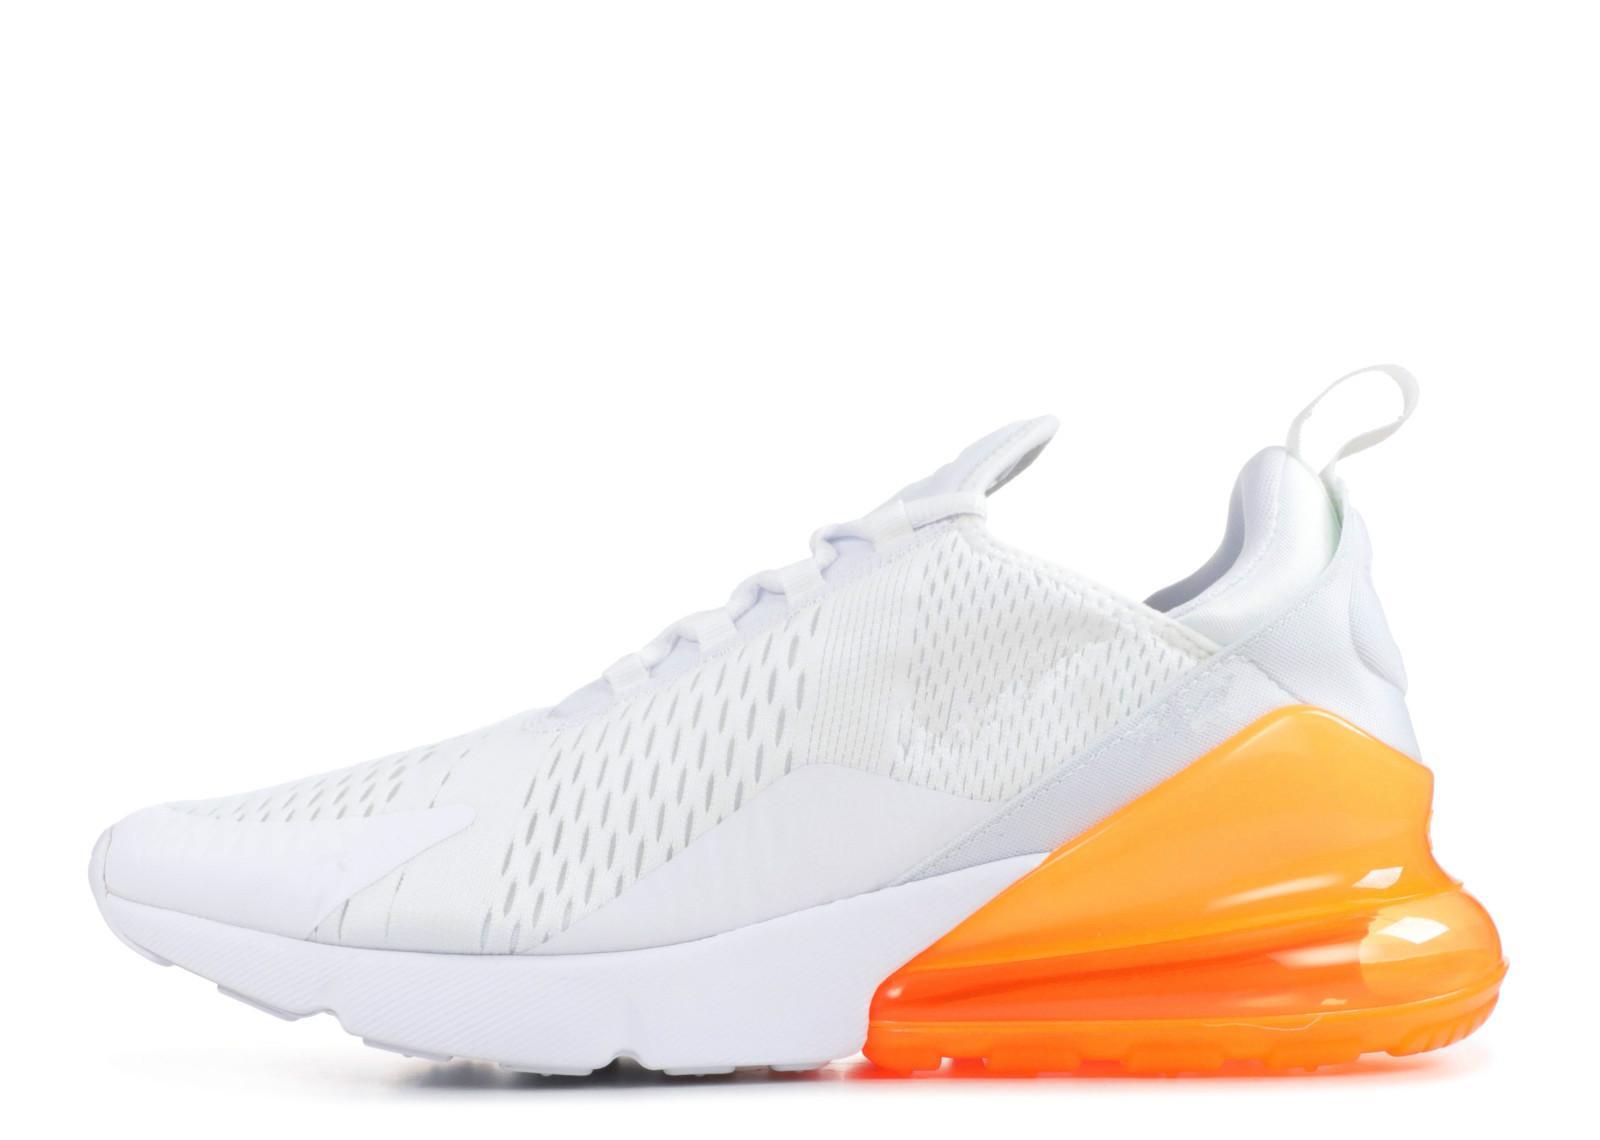 Vapormax 270 Running Shoes Gazelle For Men Casual Sneakers Women ... f9dde8ffb